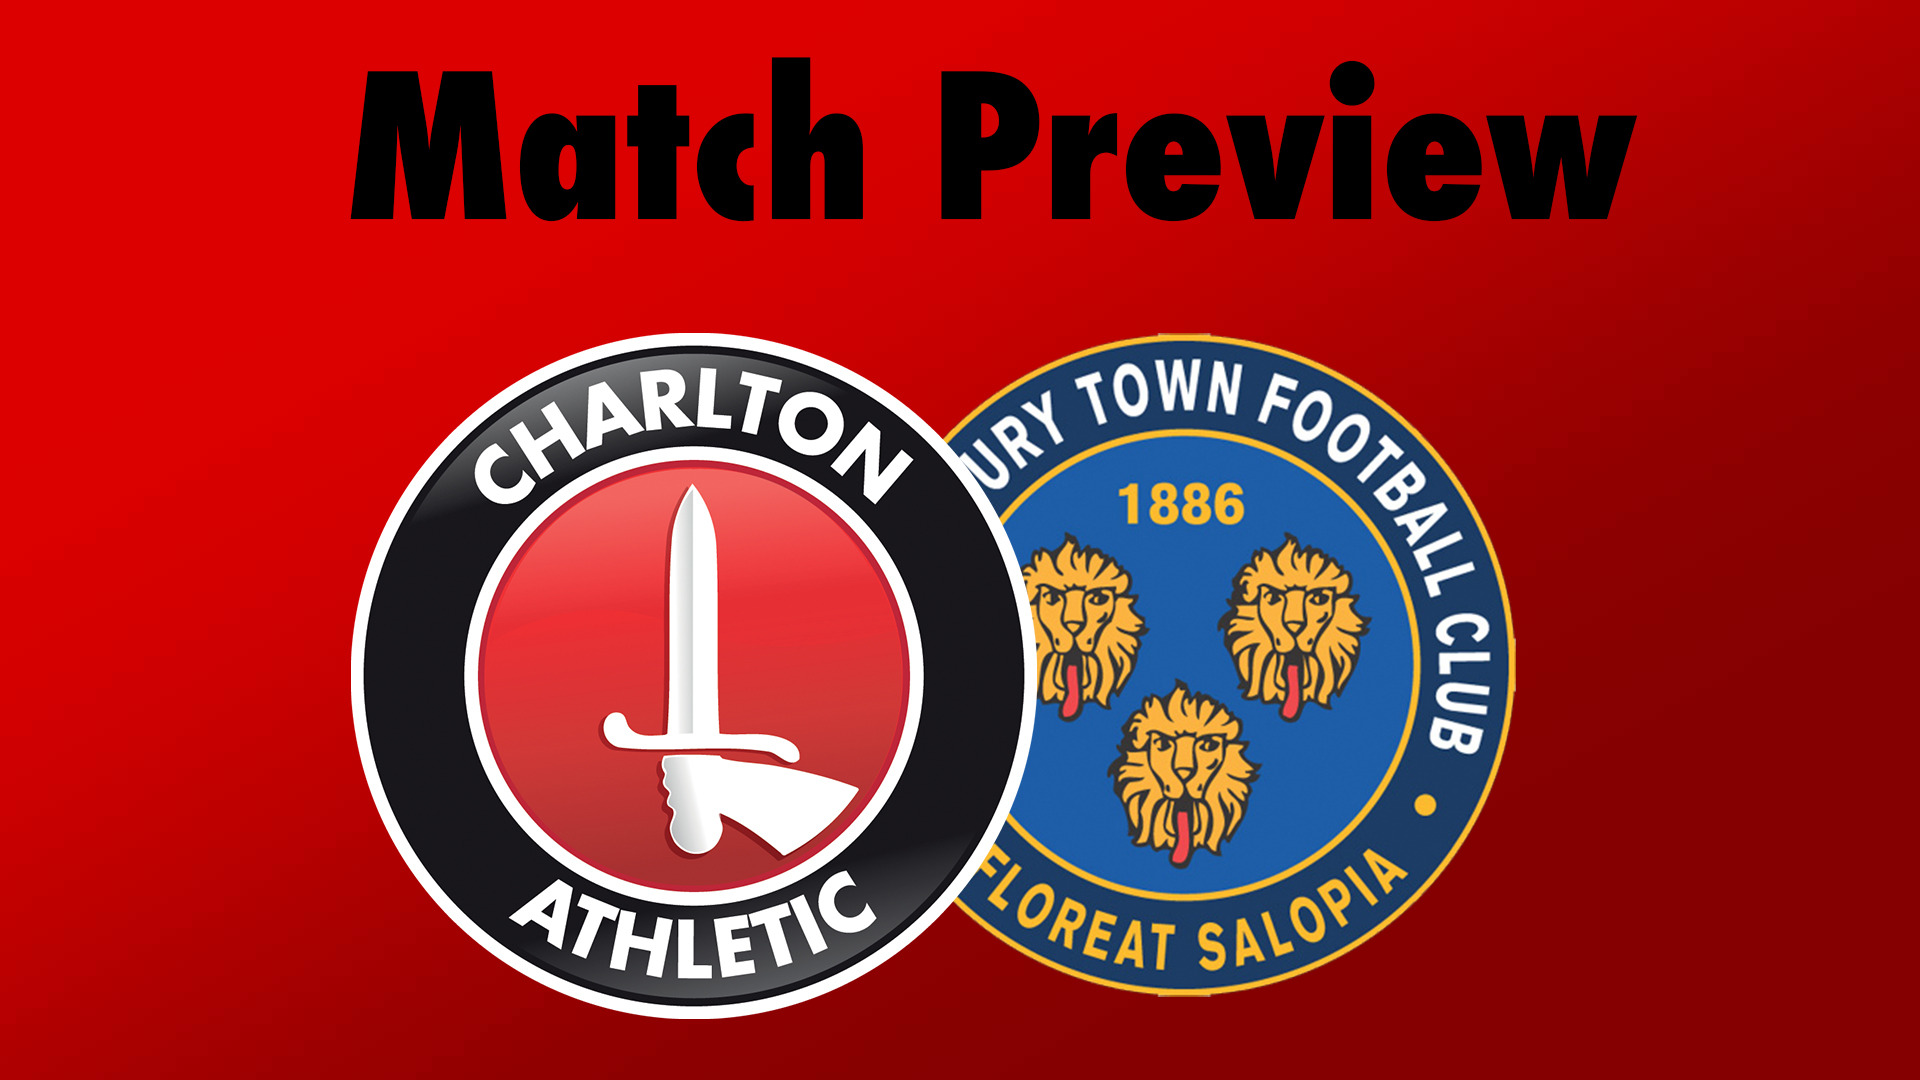 MATCH PREVIEW | Charlton v Shrewsbury